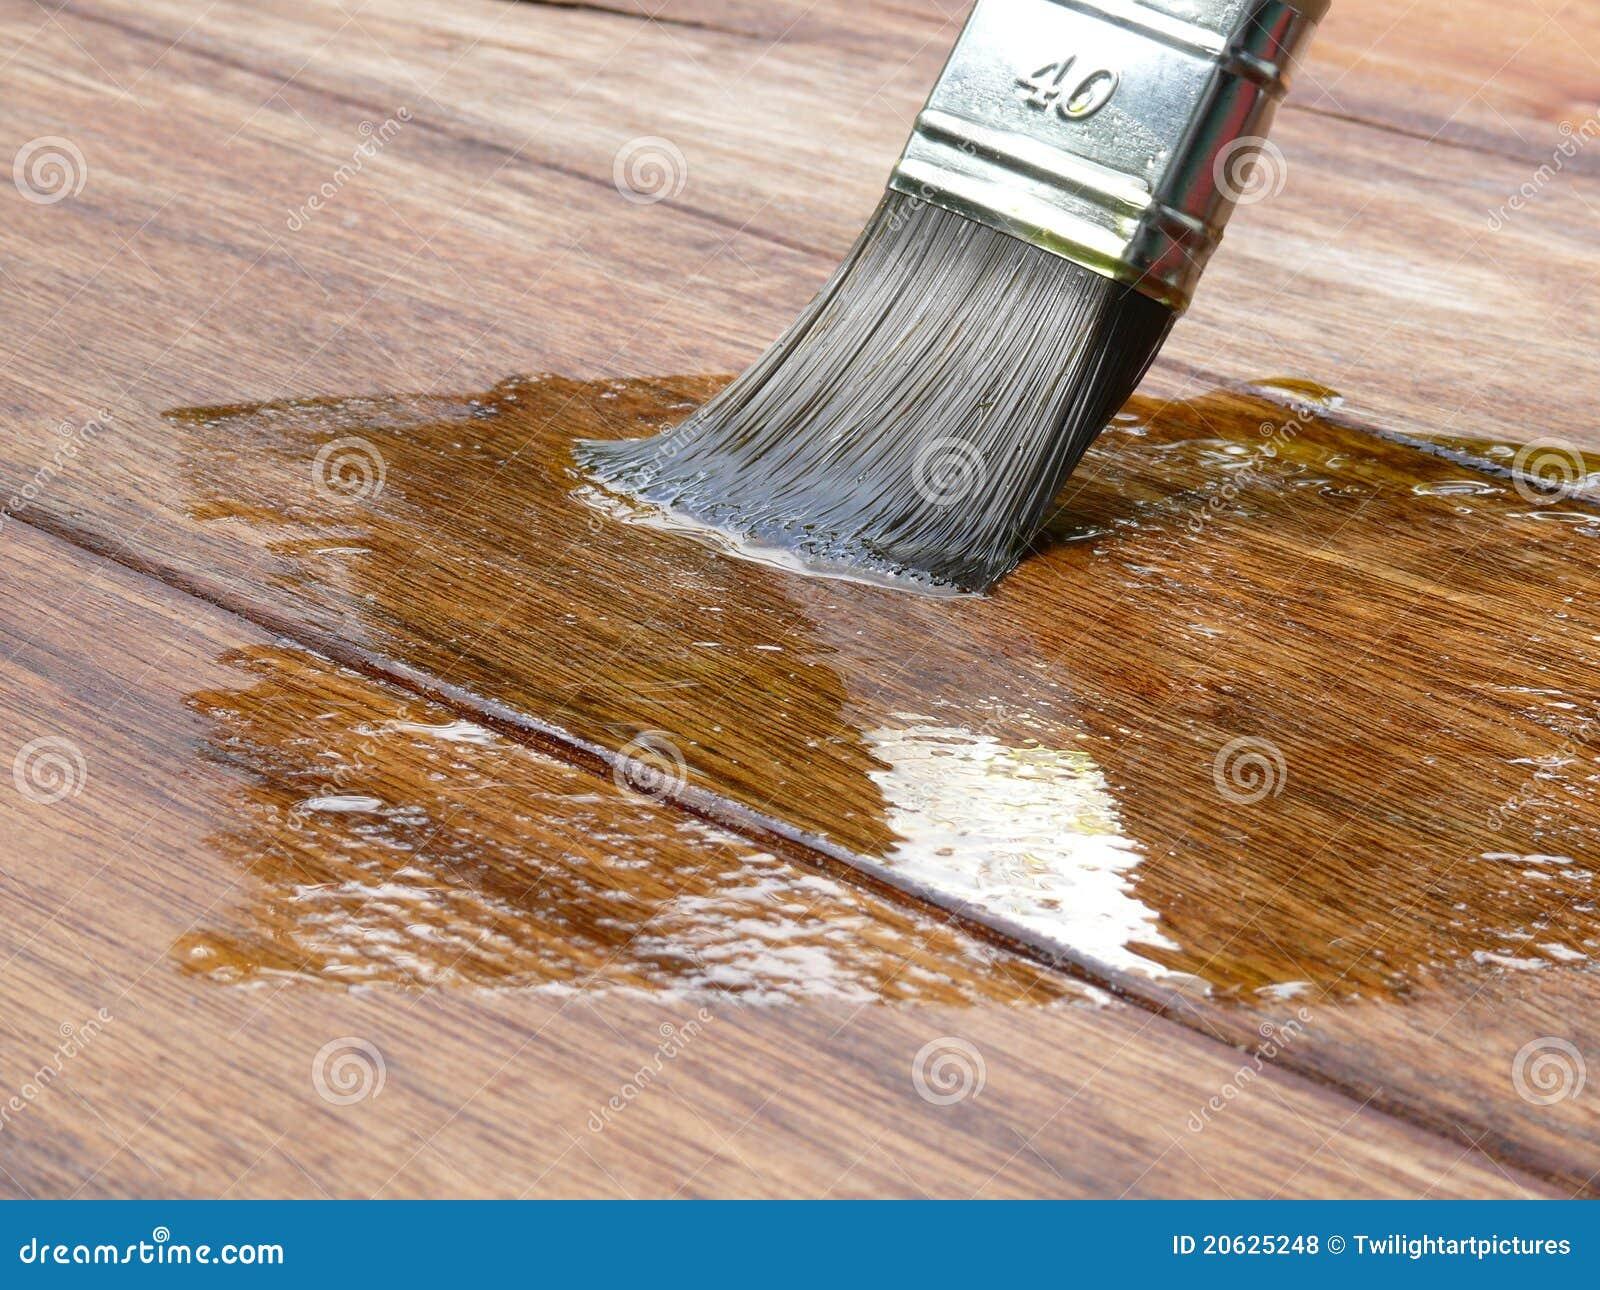 Acrylic Painting On Raw Wood